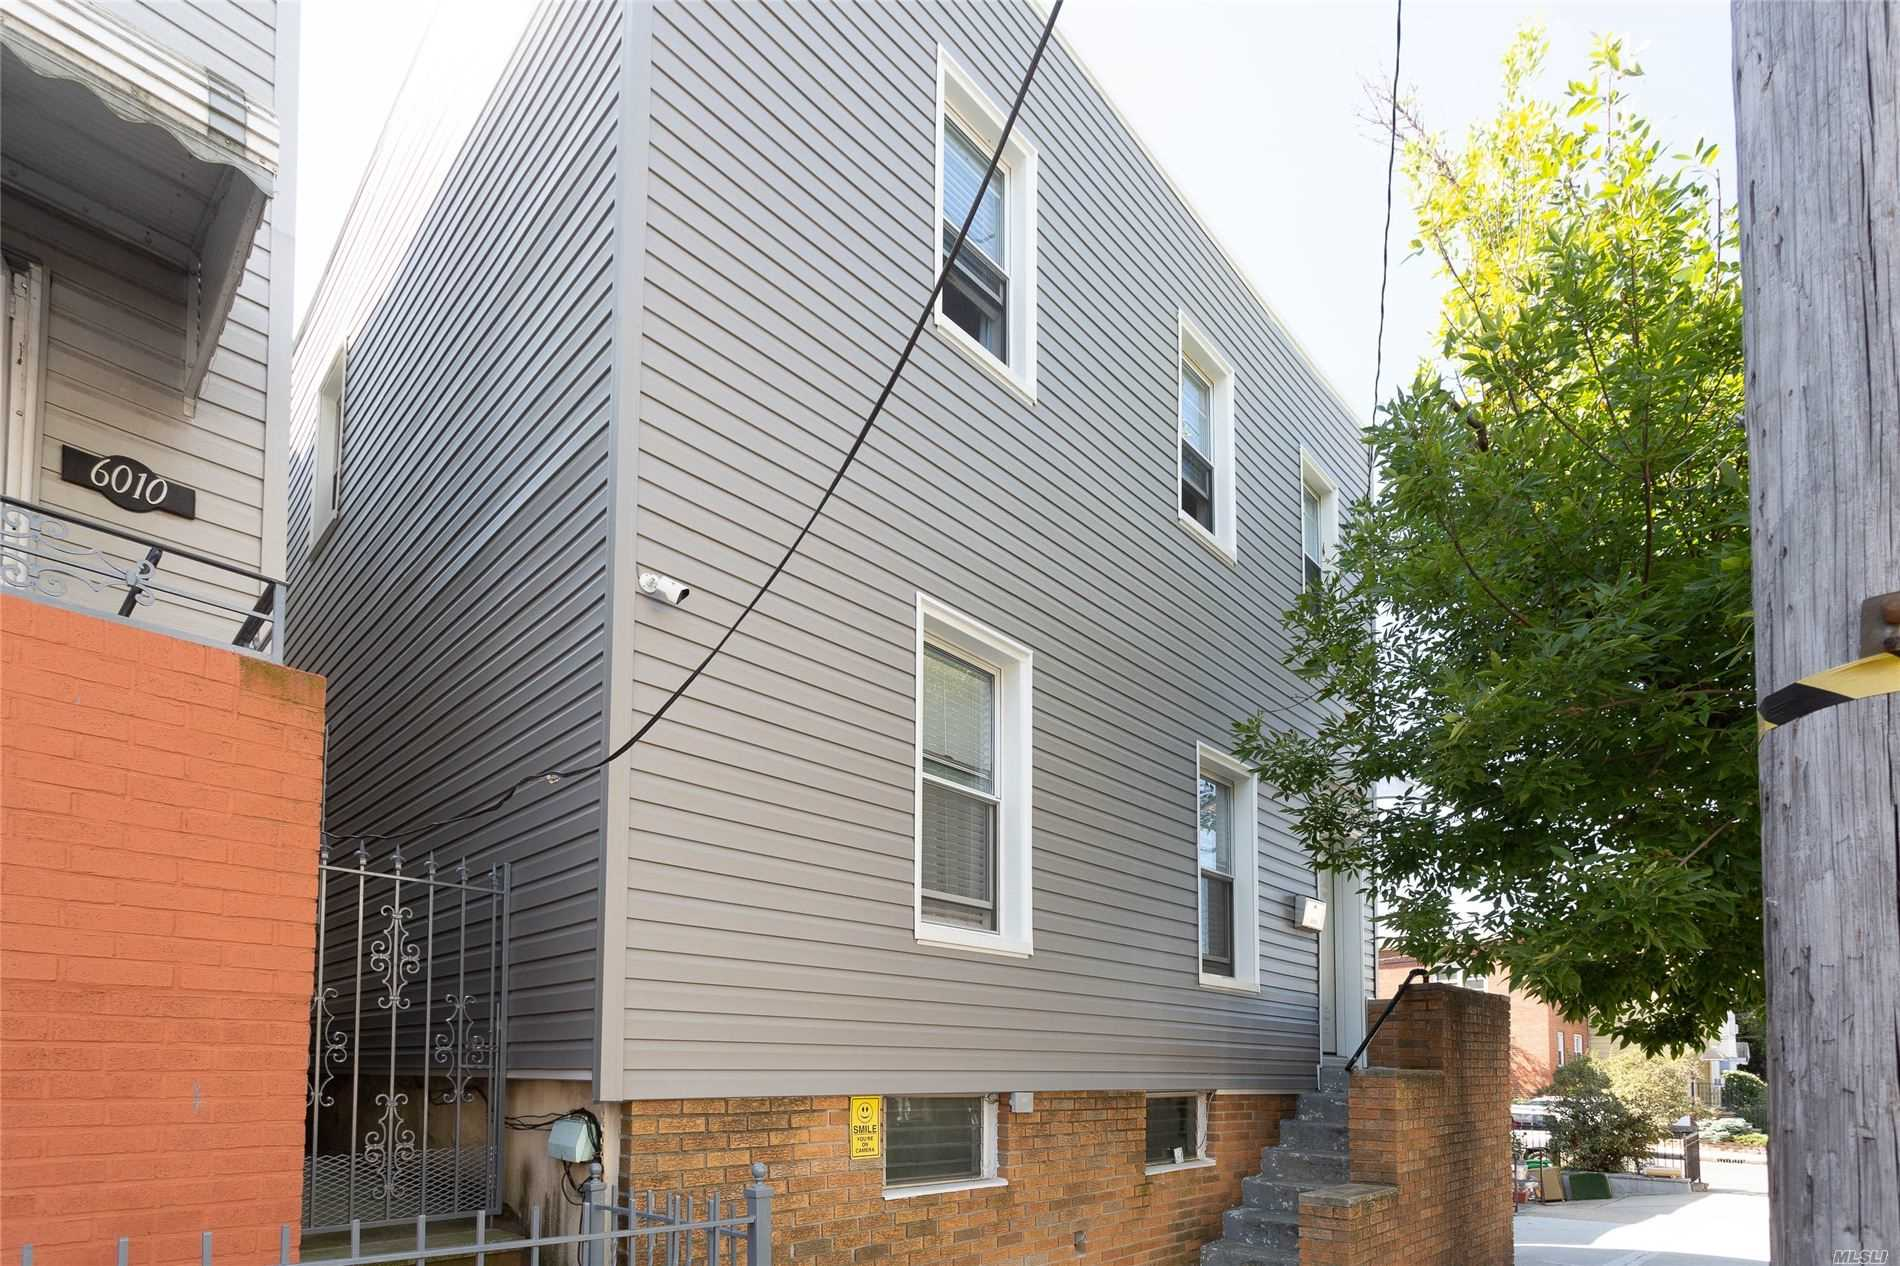 Property for sale at 60-08 56th Drive, Maspeth NY 11378, Maspeth,  New York 11378